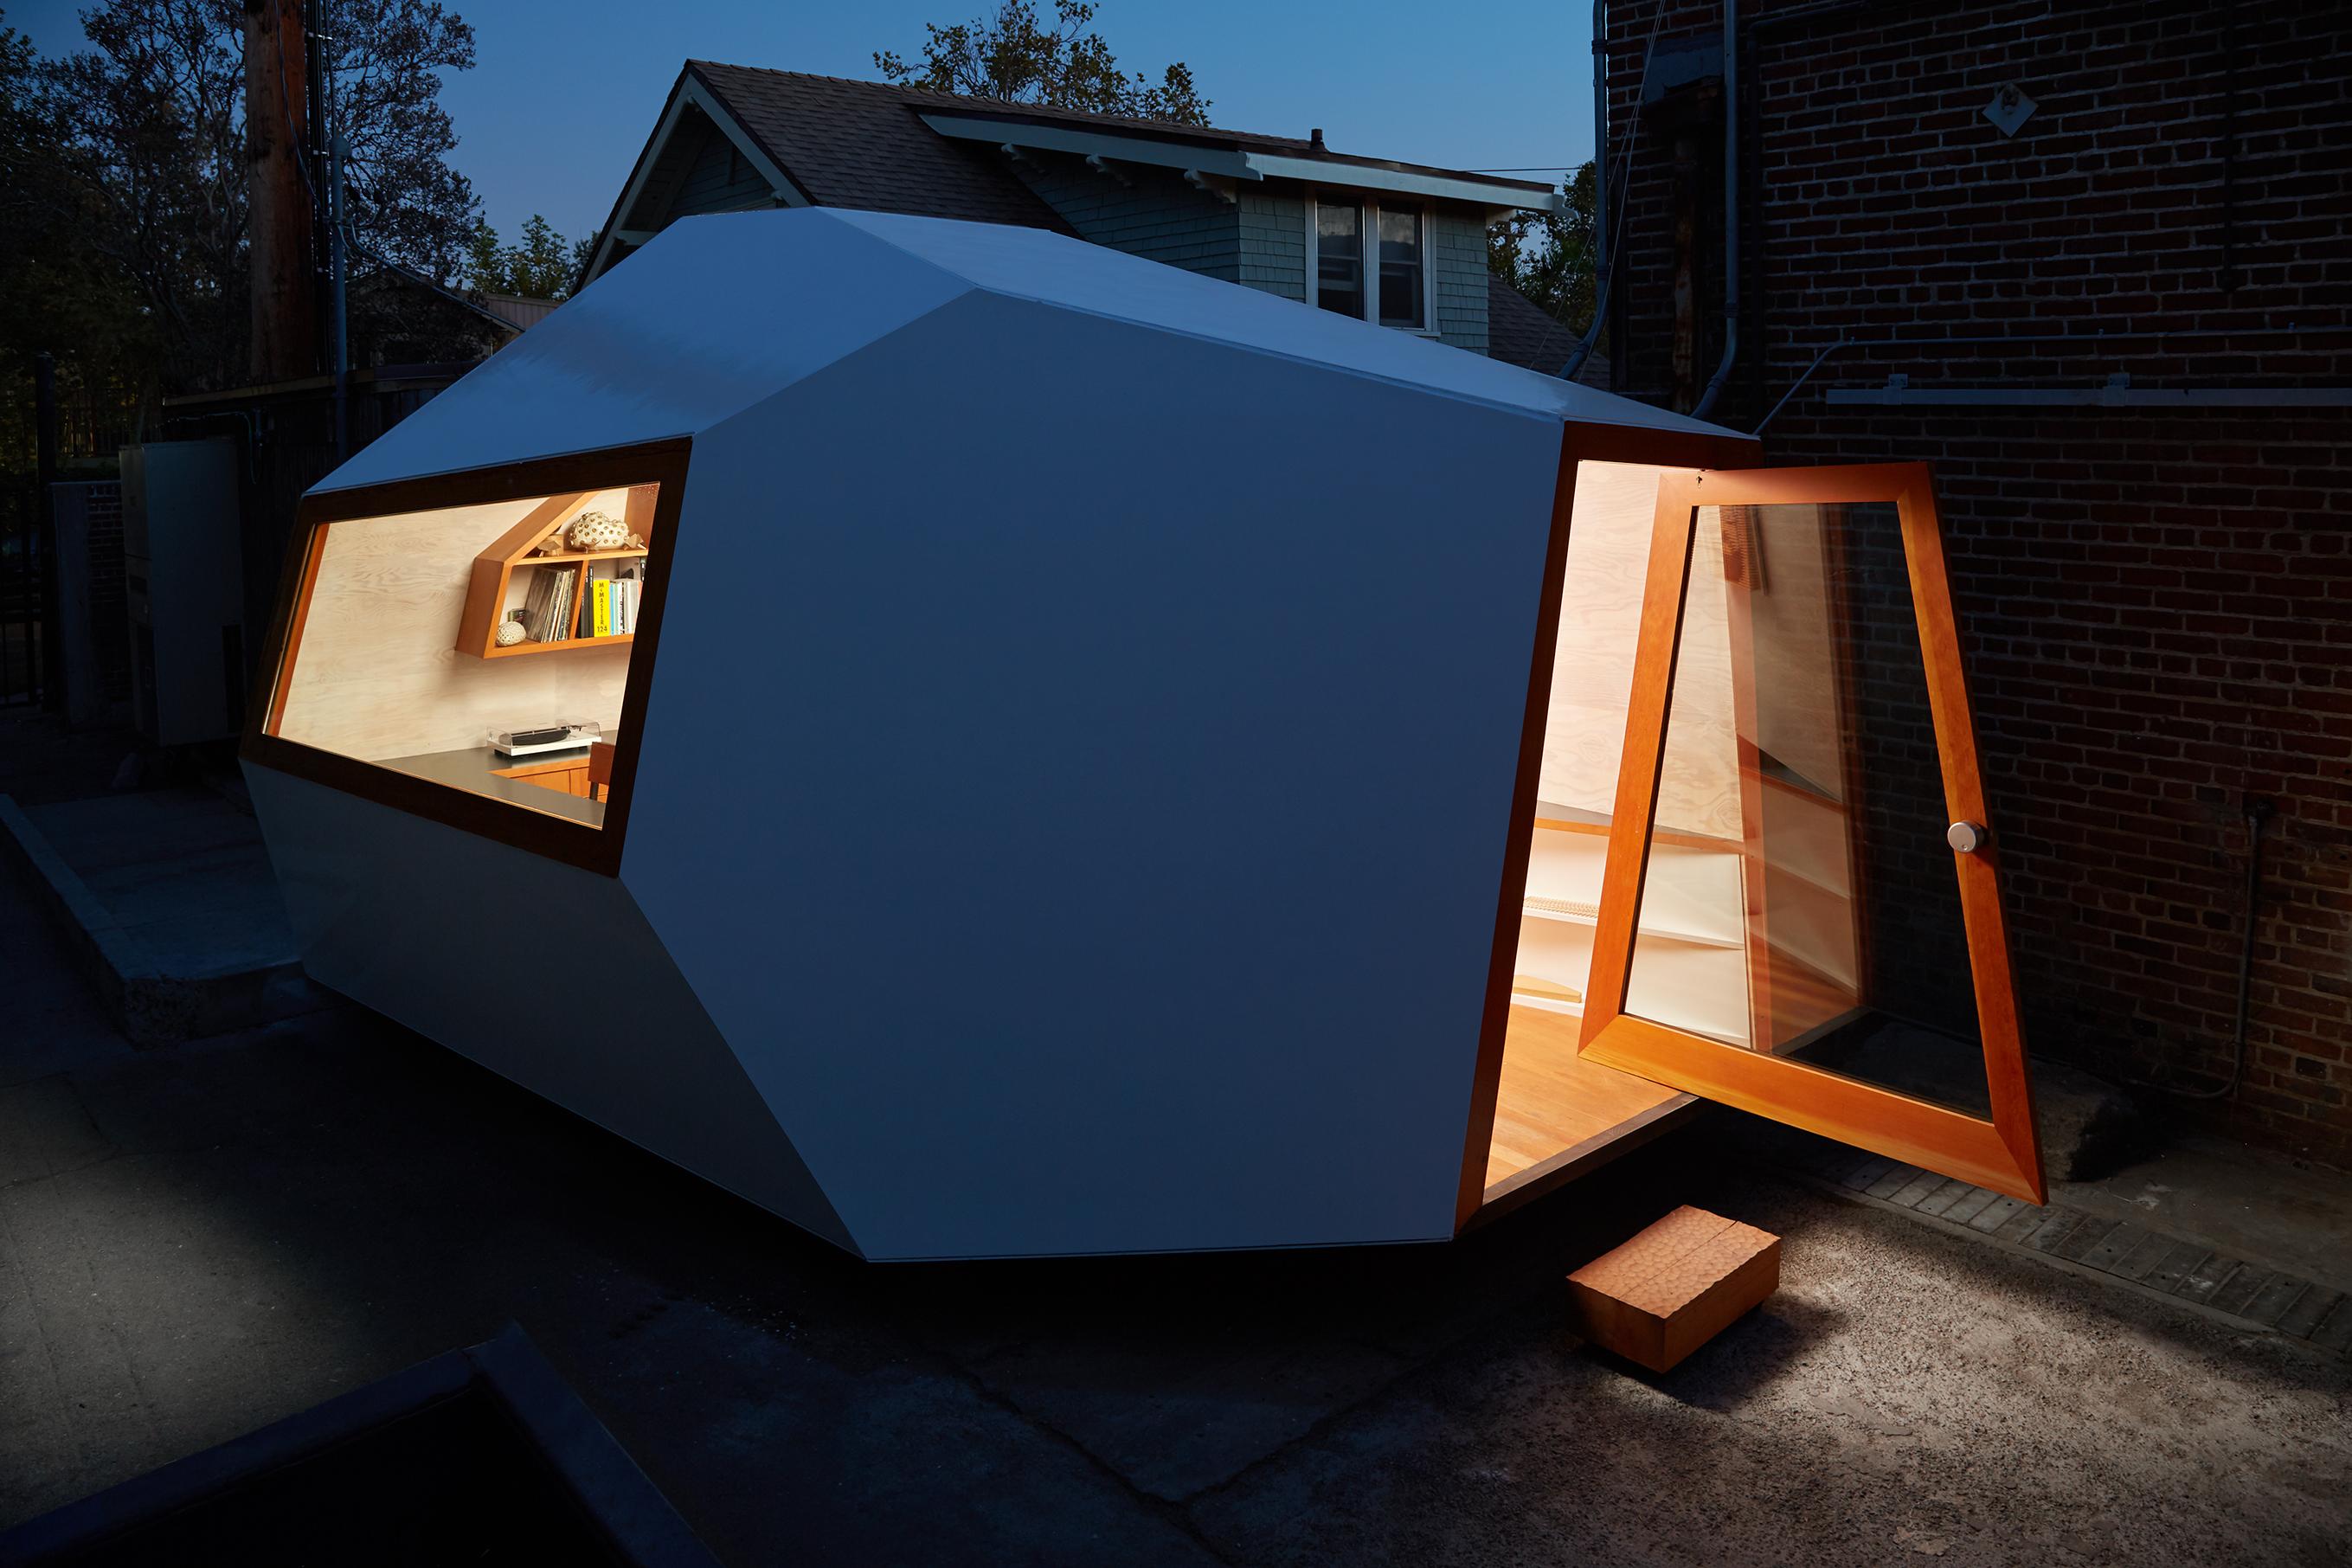 Small white angular building at night